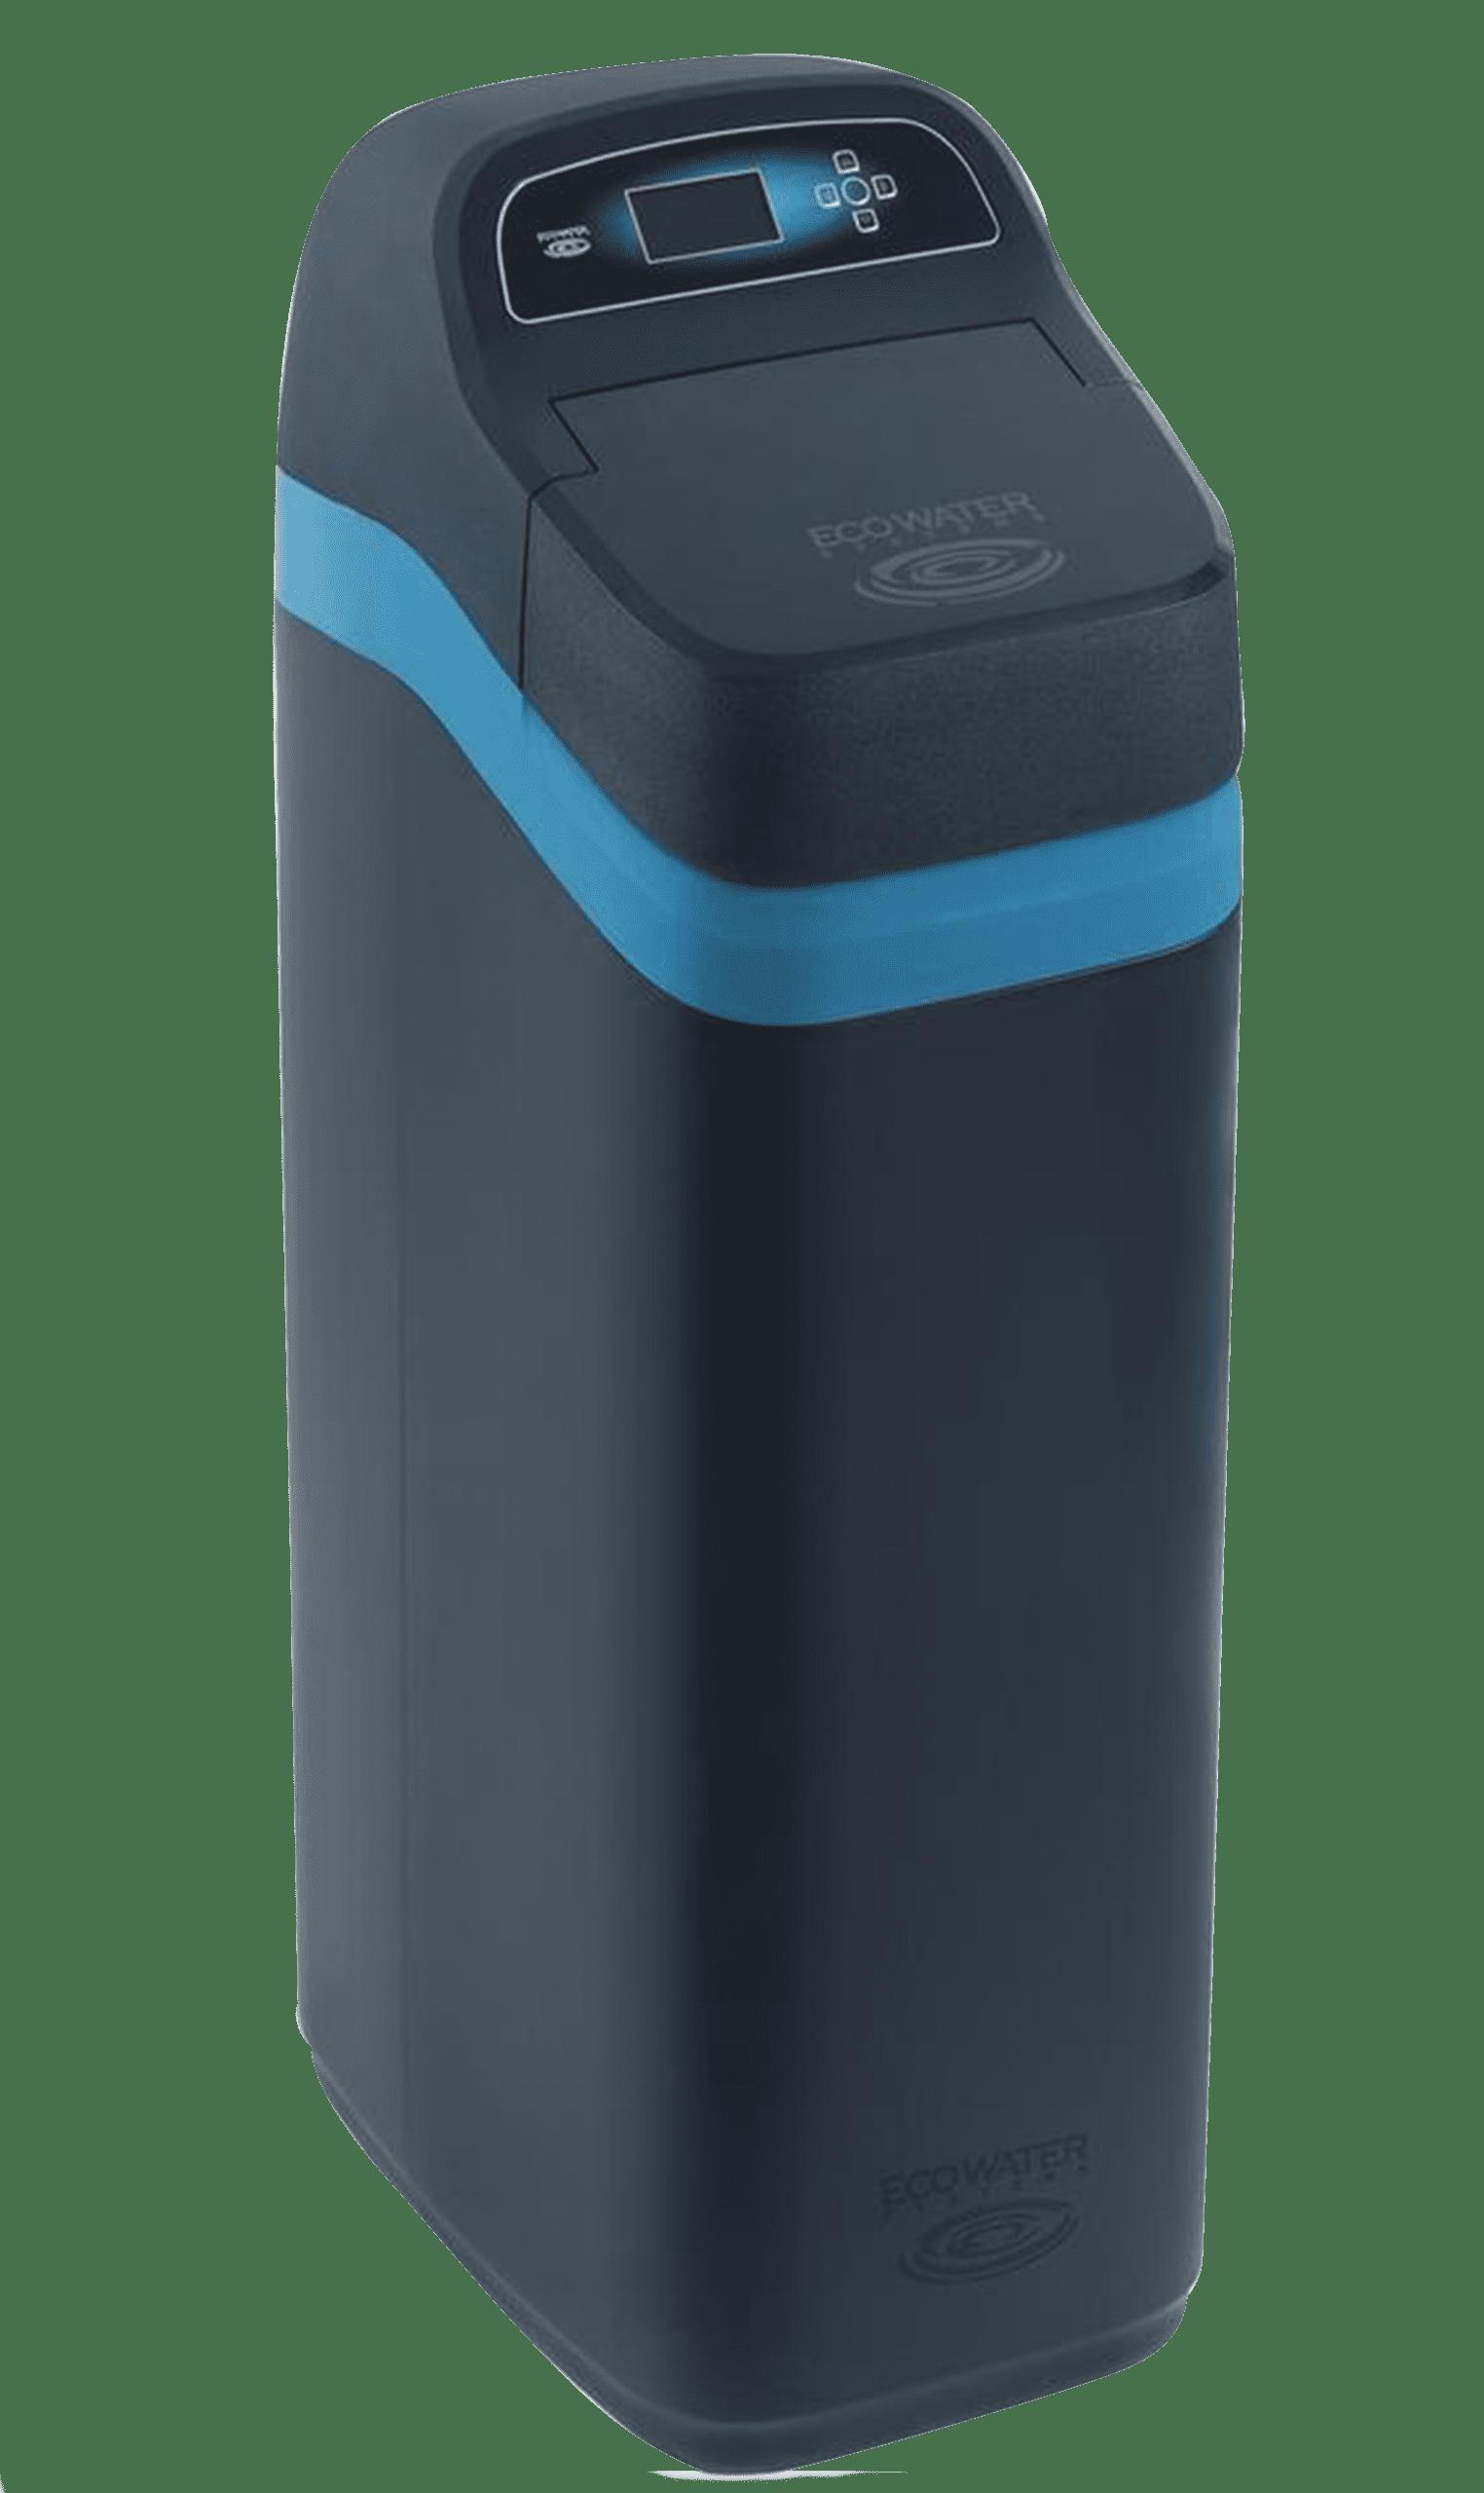 ECR3700 Water Softener by EcoWater of Atlanta